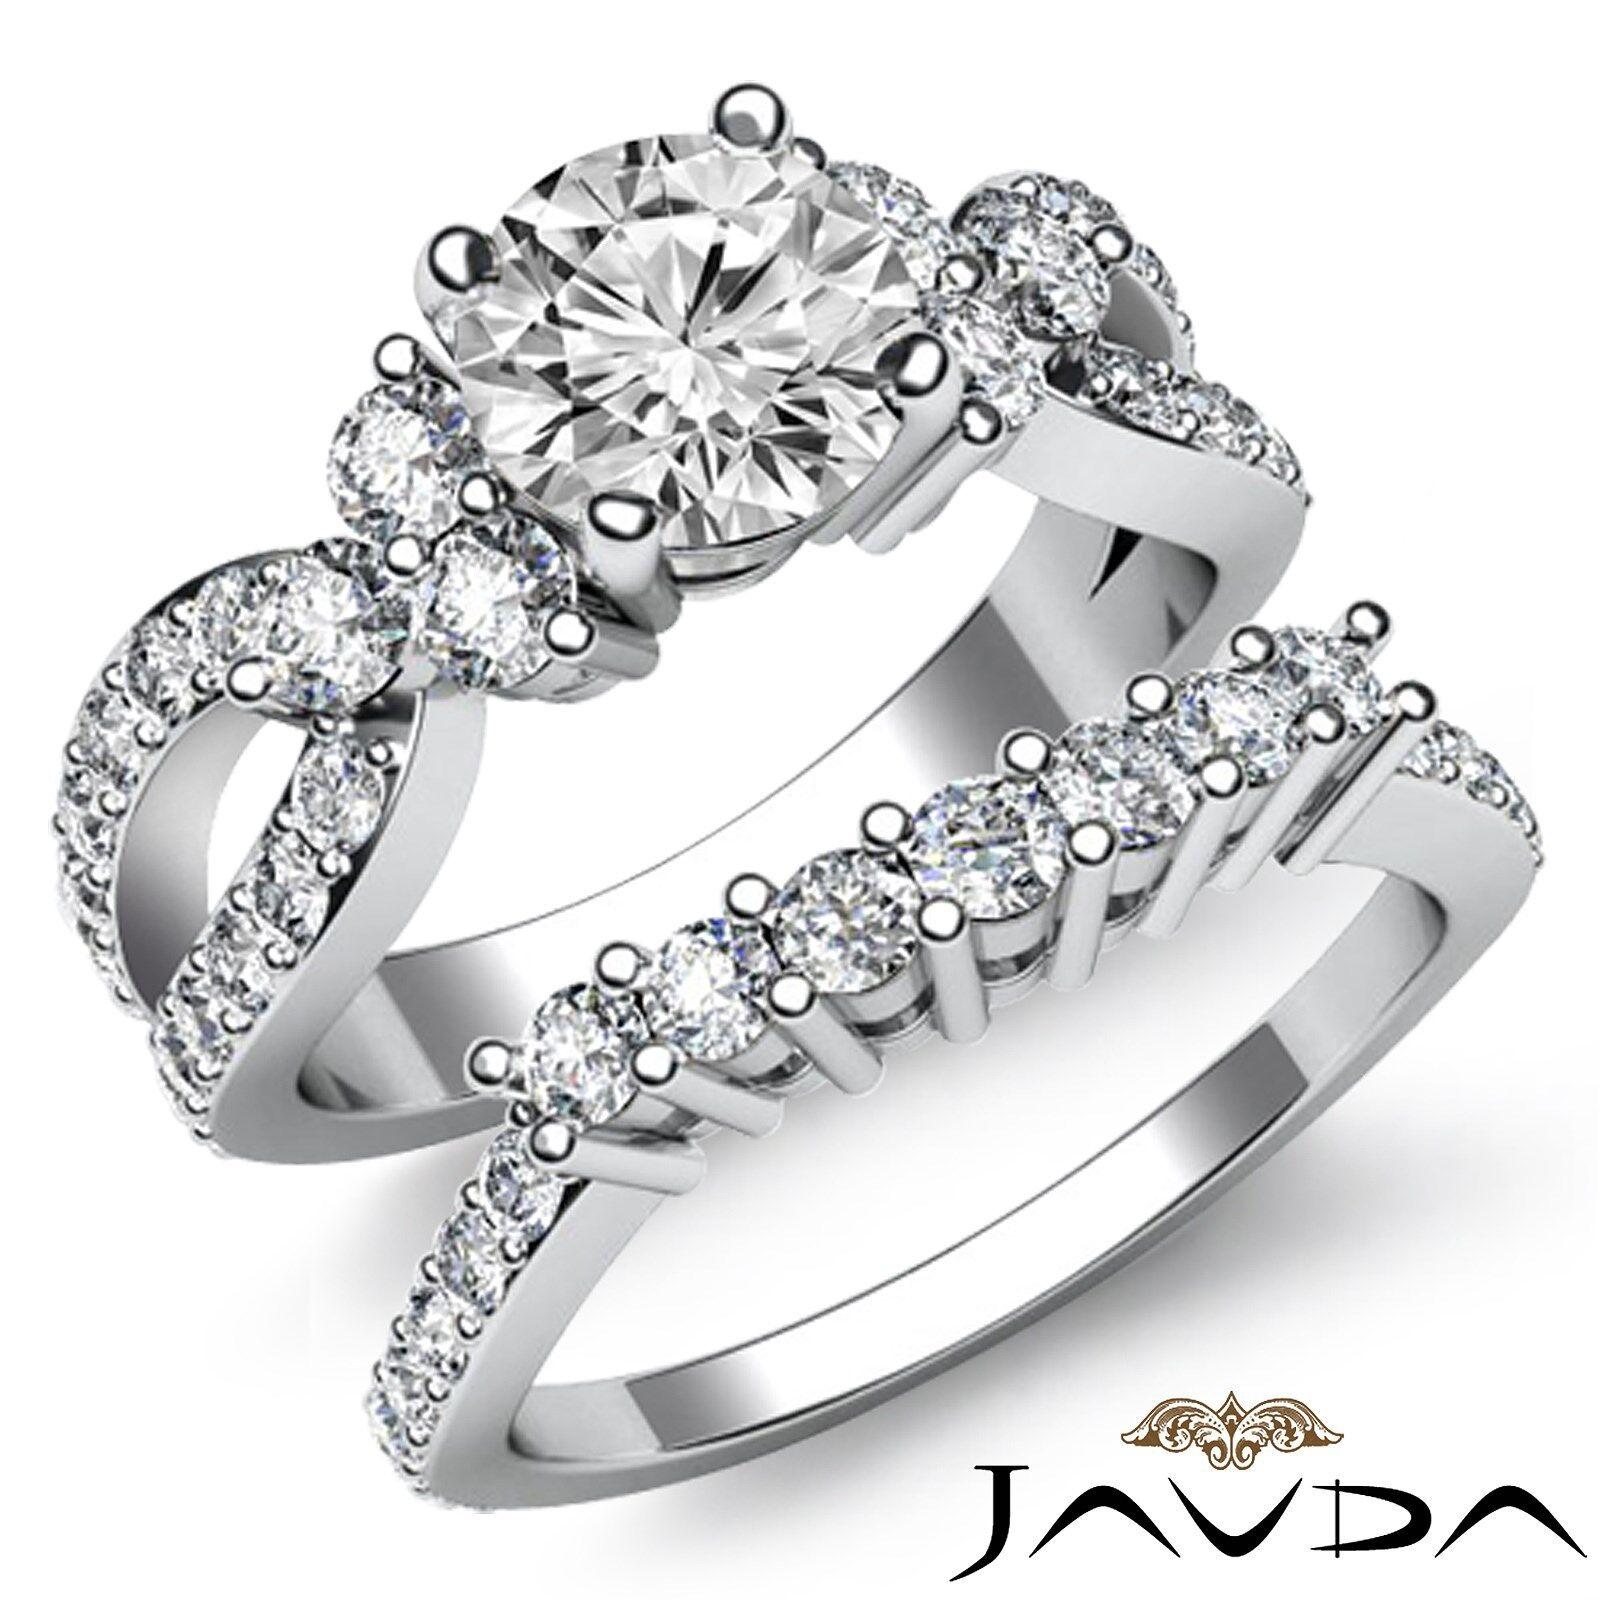 Vintage 3.05ct Round Shape Diamond Engagement Bridal Set GIA F VS2 Platinum Ring